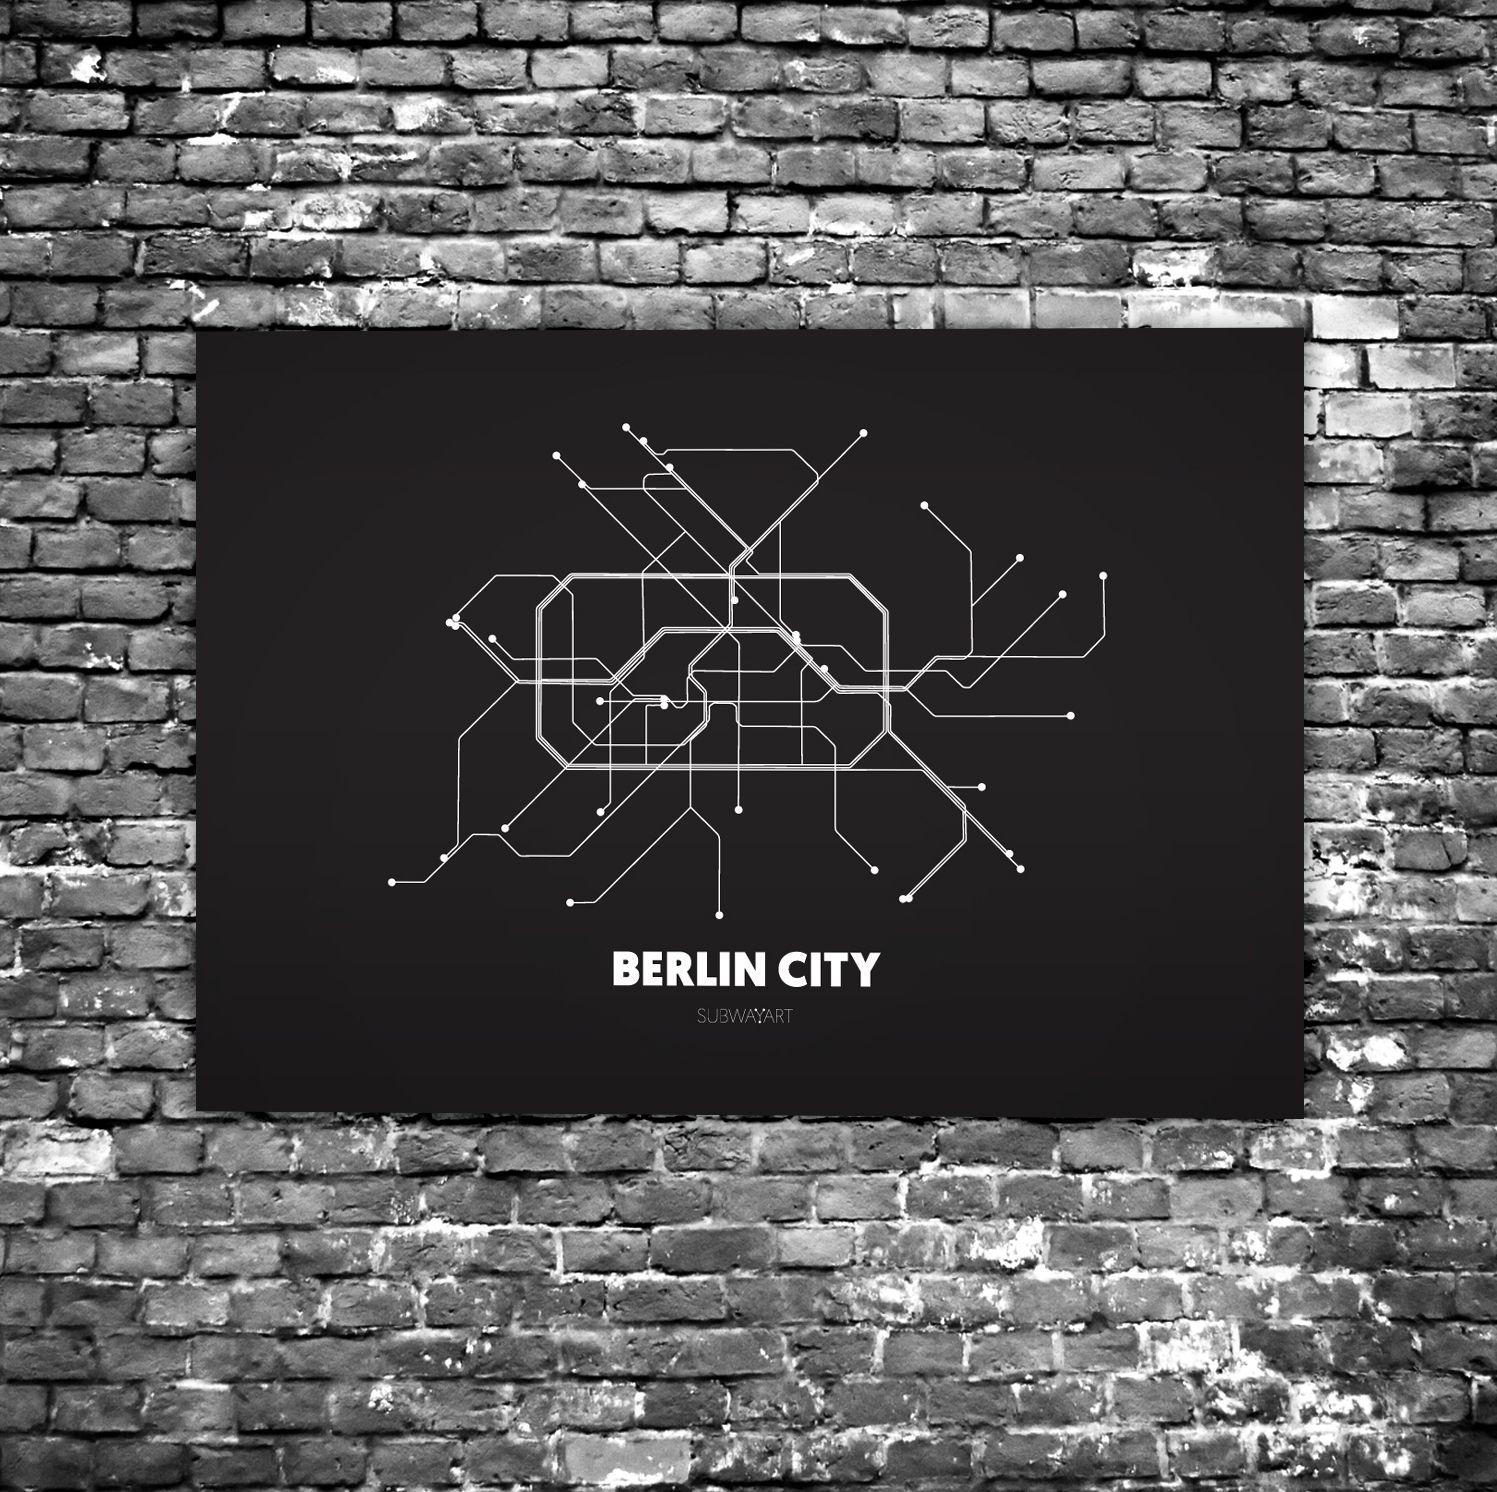 Plexiglas Berlin berlin city c1 acrylic glass subway maps u bahn karte